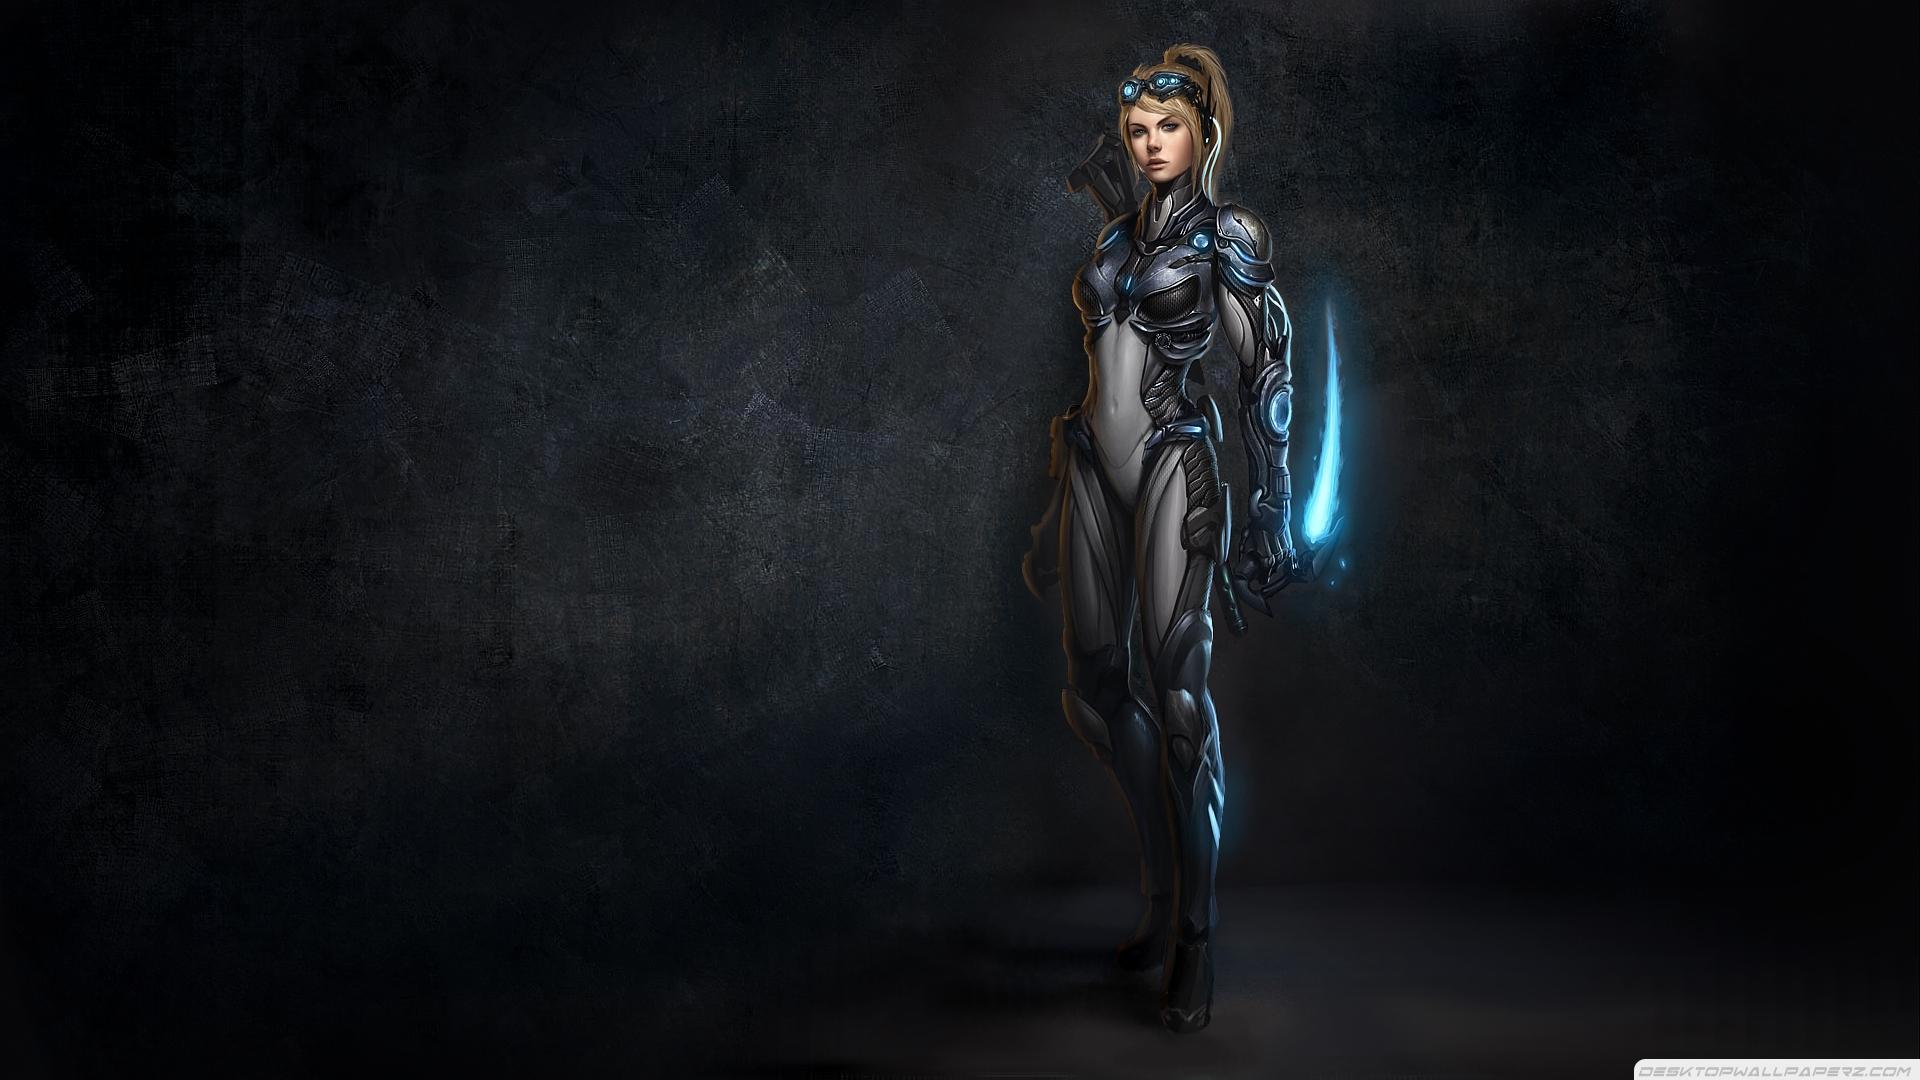 Ii Ghost Nova Artwork Female Warriors 19201080 81668 HD Wallpaper 1920x1080